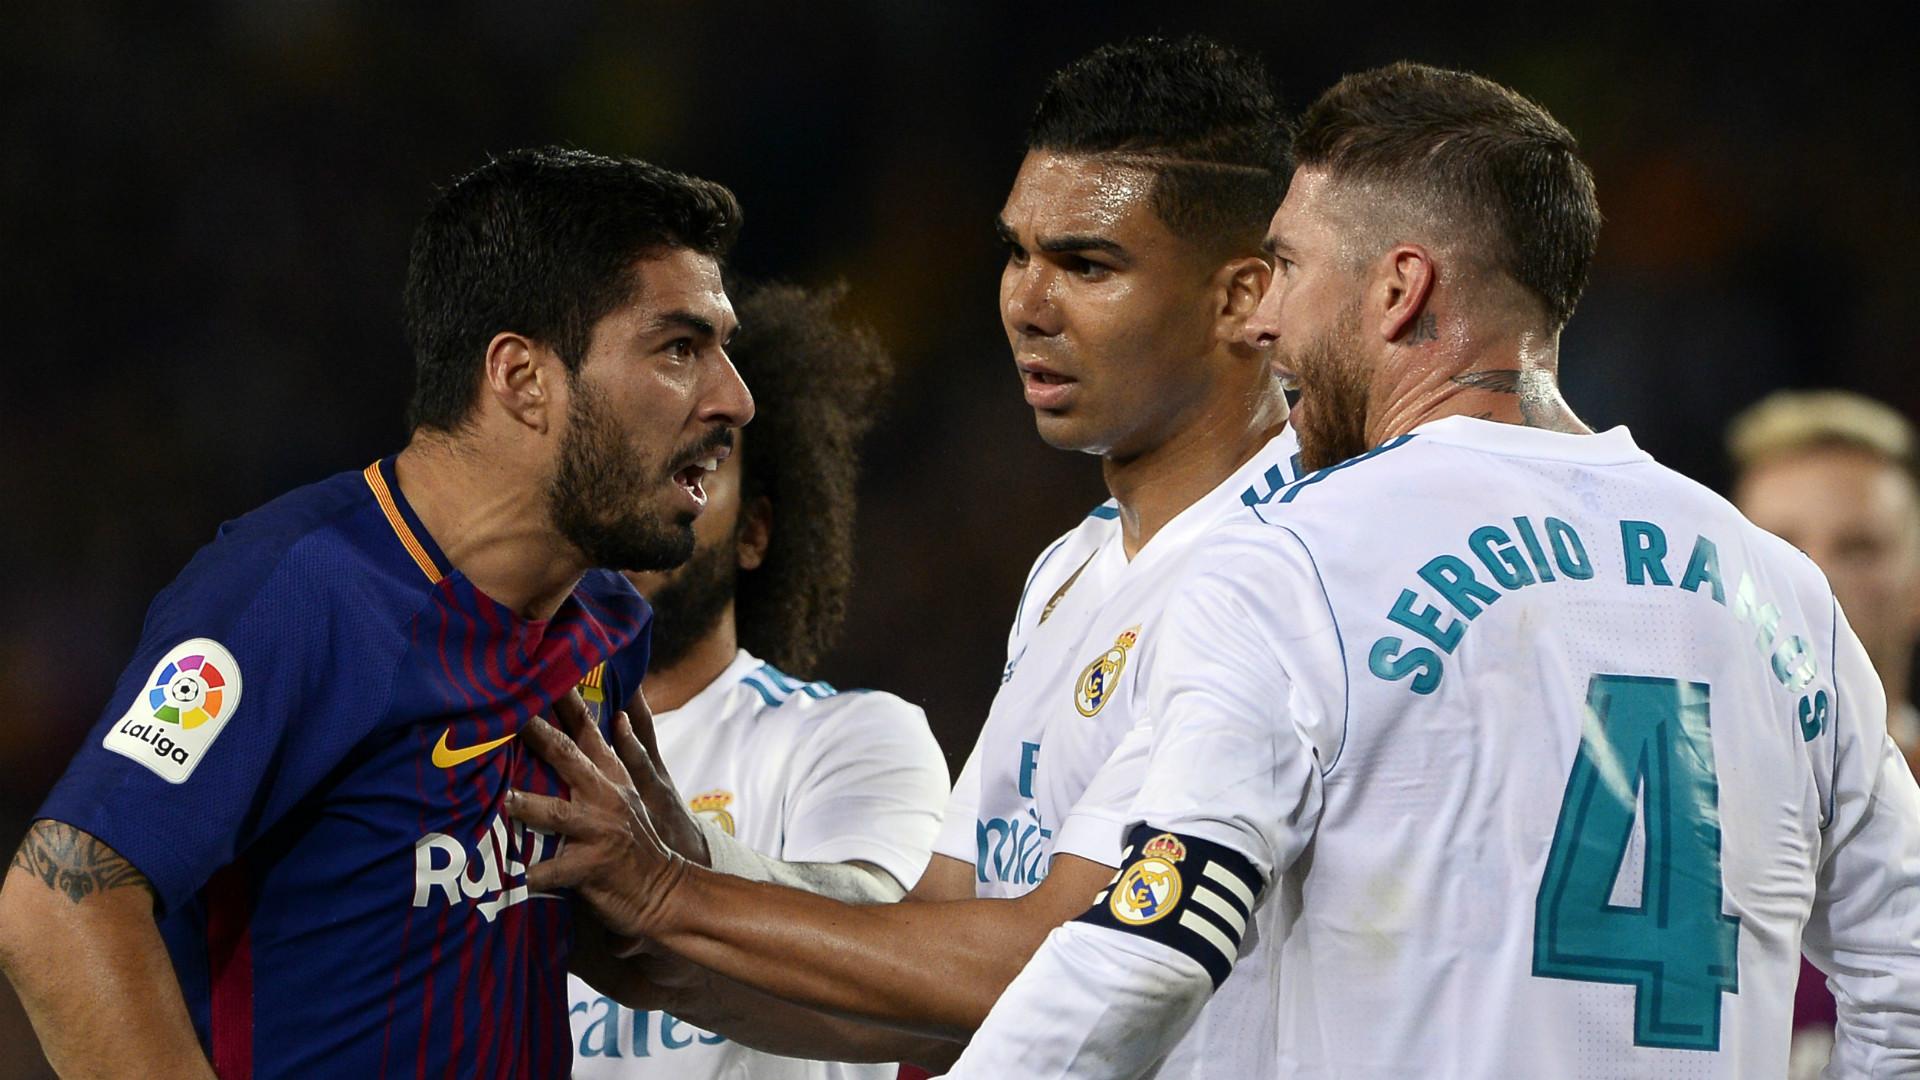 Barcelona Vs Real Madrid El Clasico Is Sh T Robert Huth Can T Stand Battle Between La Liga Giants Goal Com